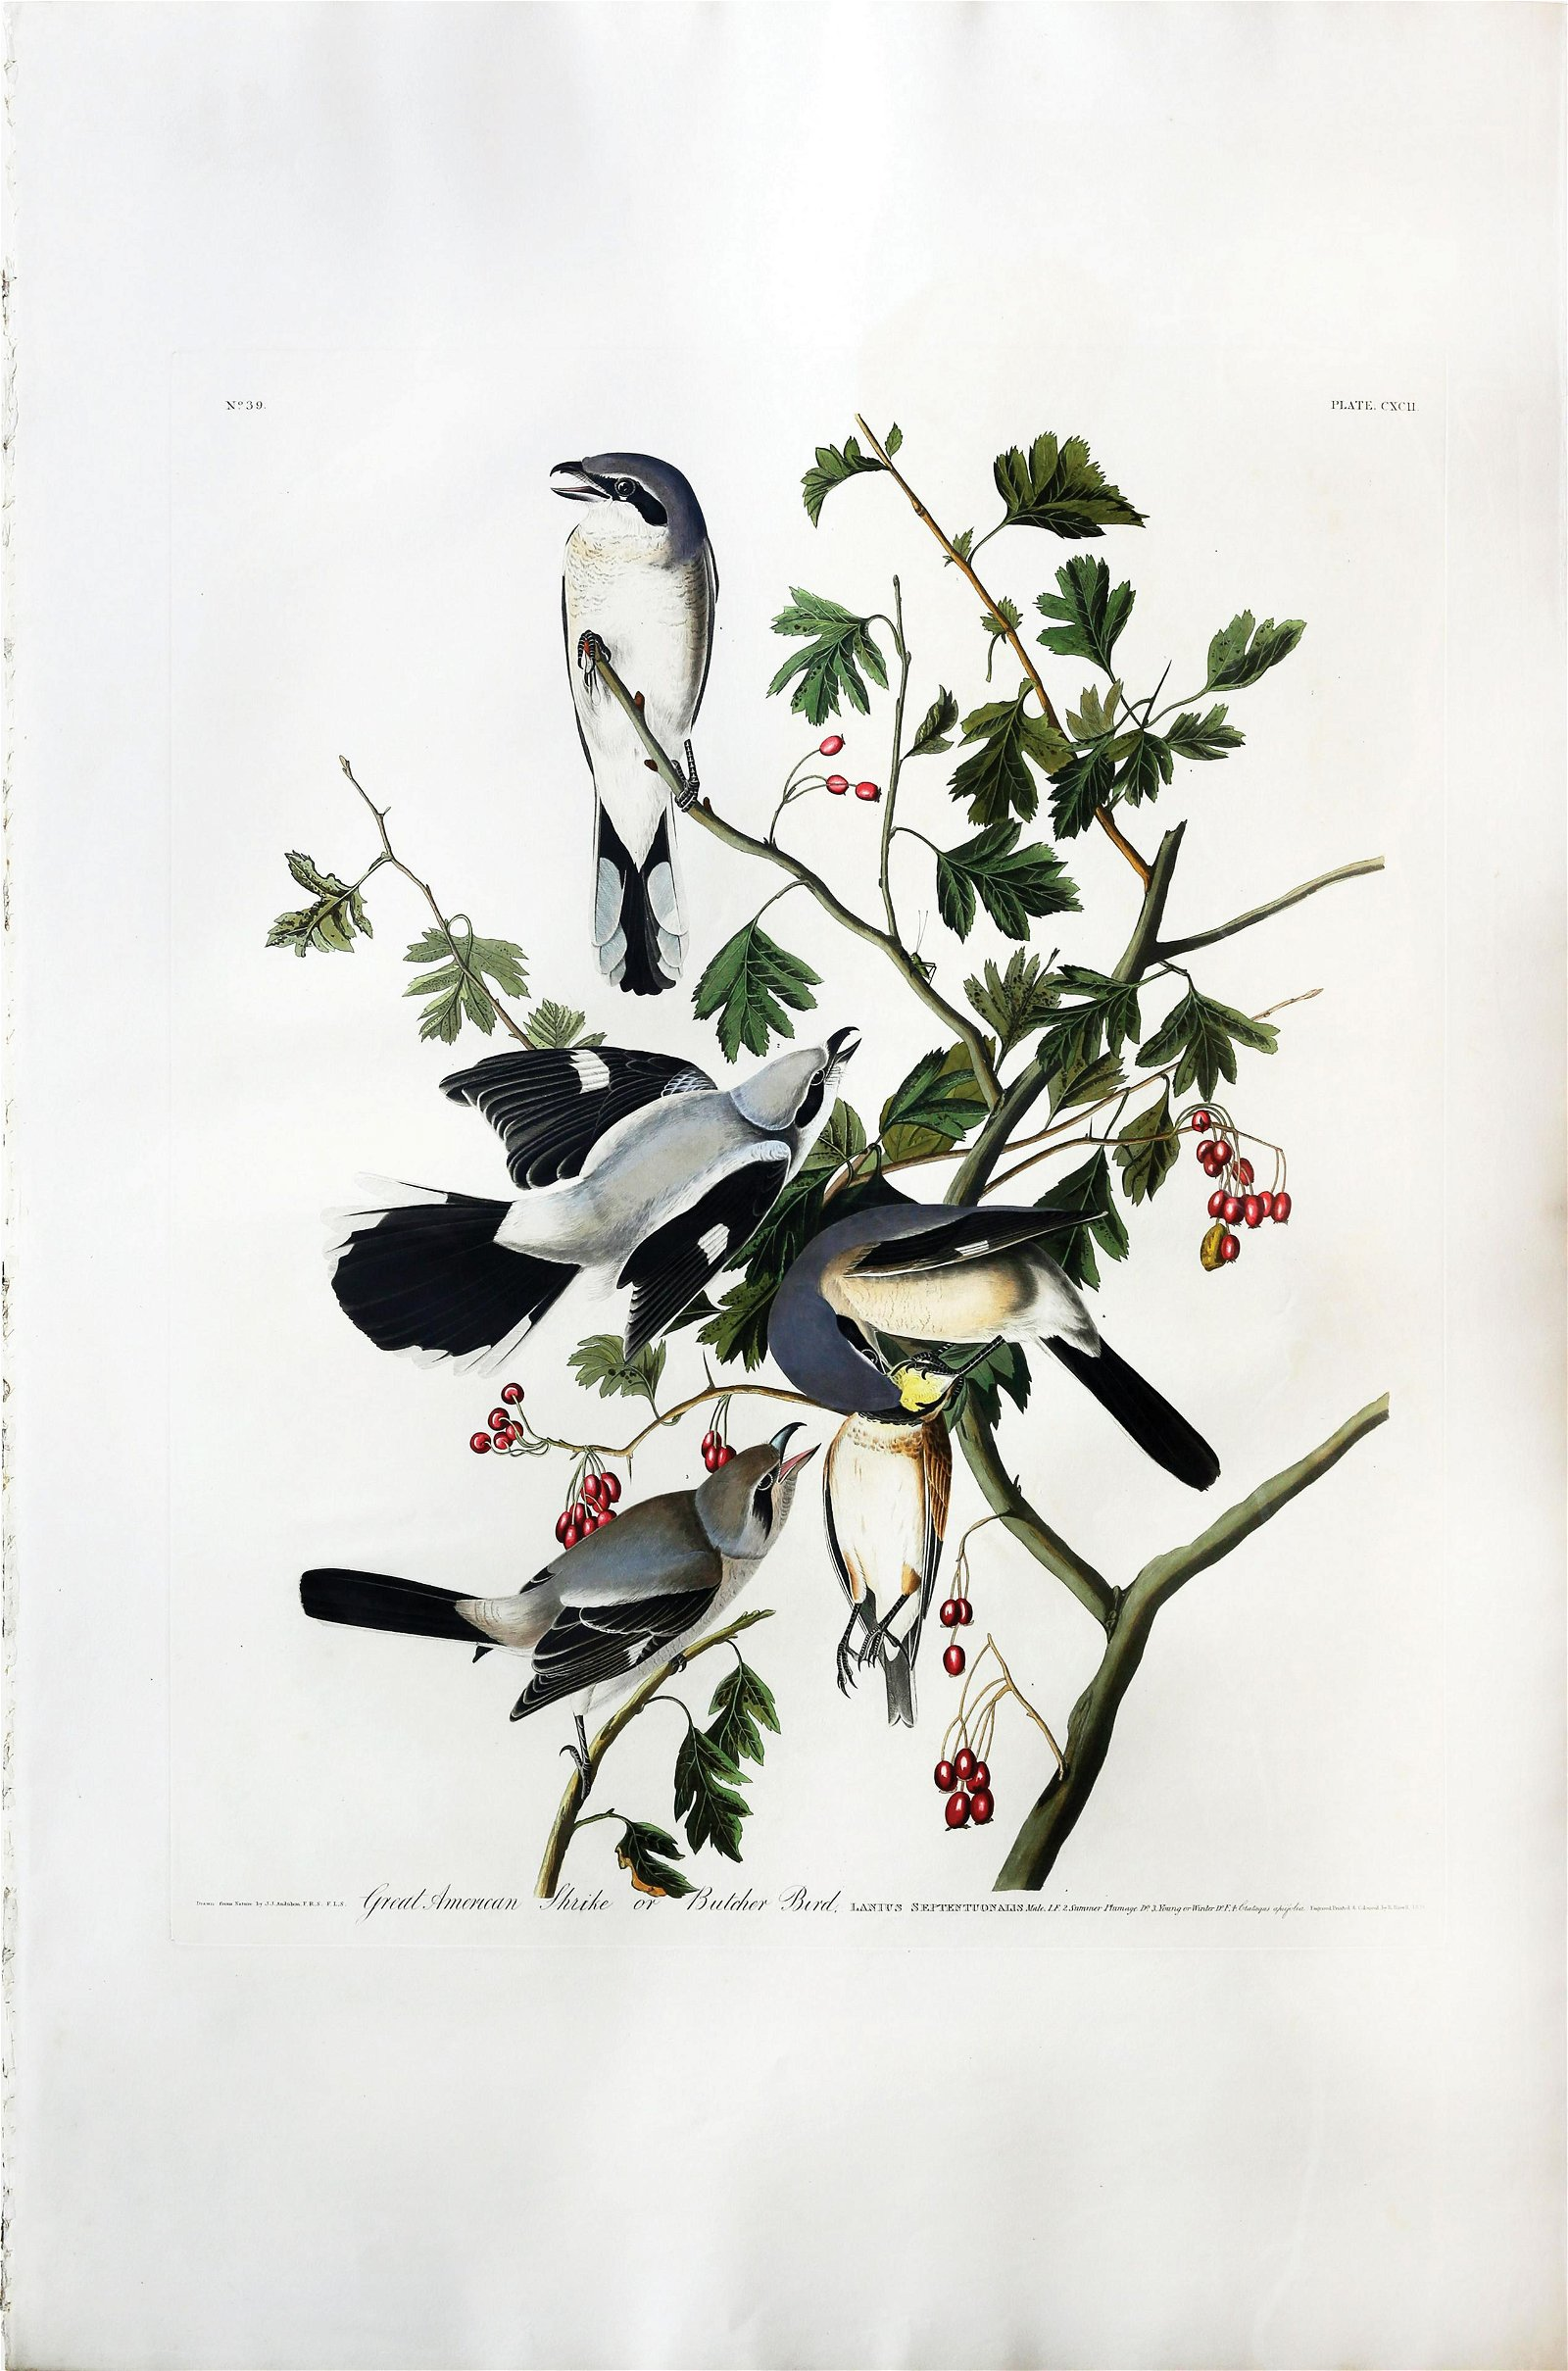 Audubon Aquatint, Great American or Cinereous Shrike